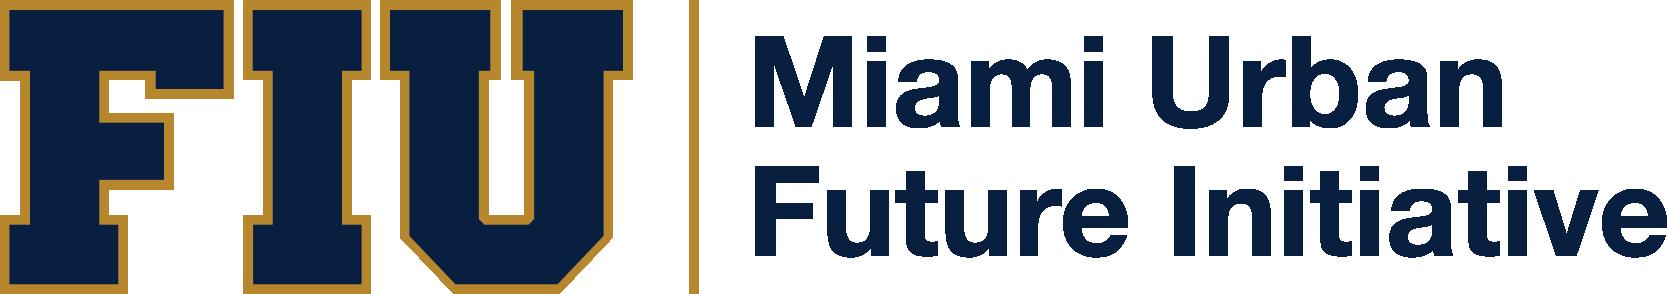 Miami Urban Future Initiative Logo